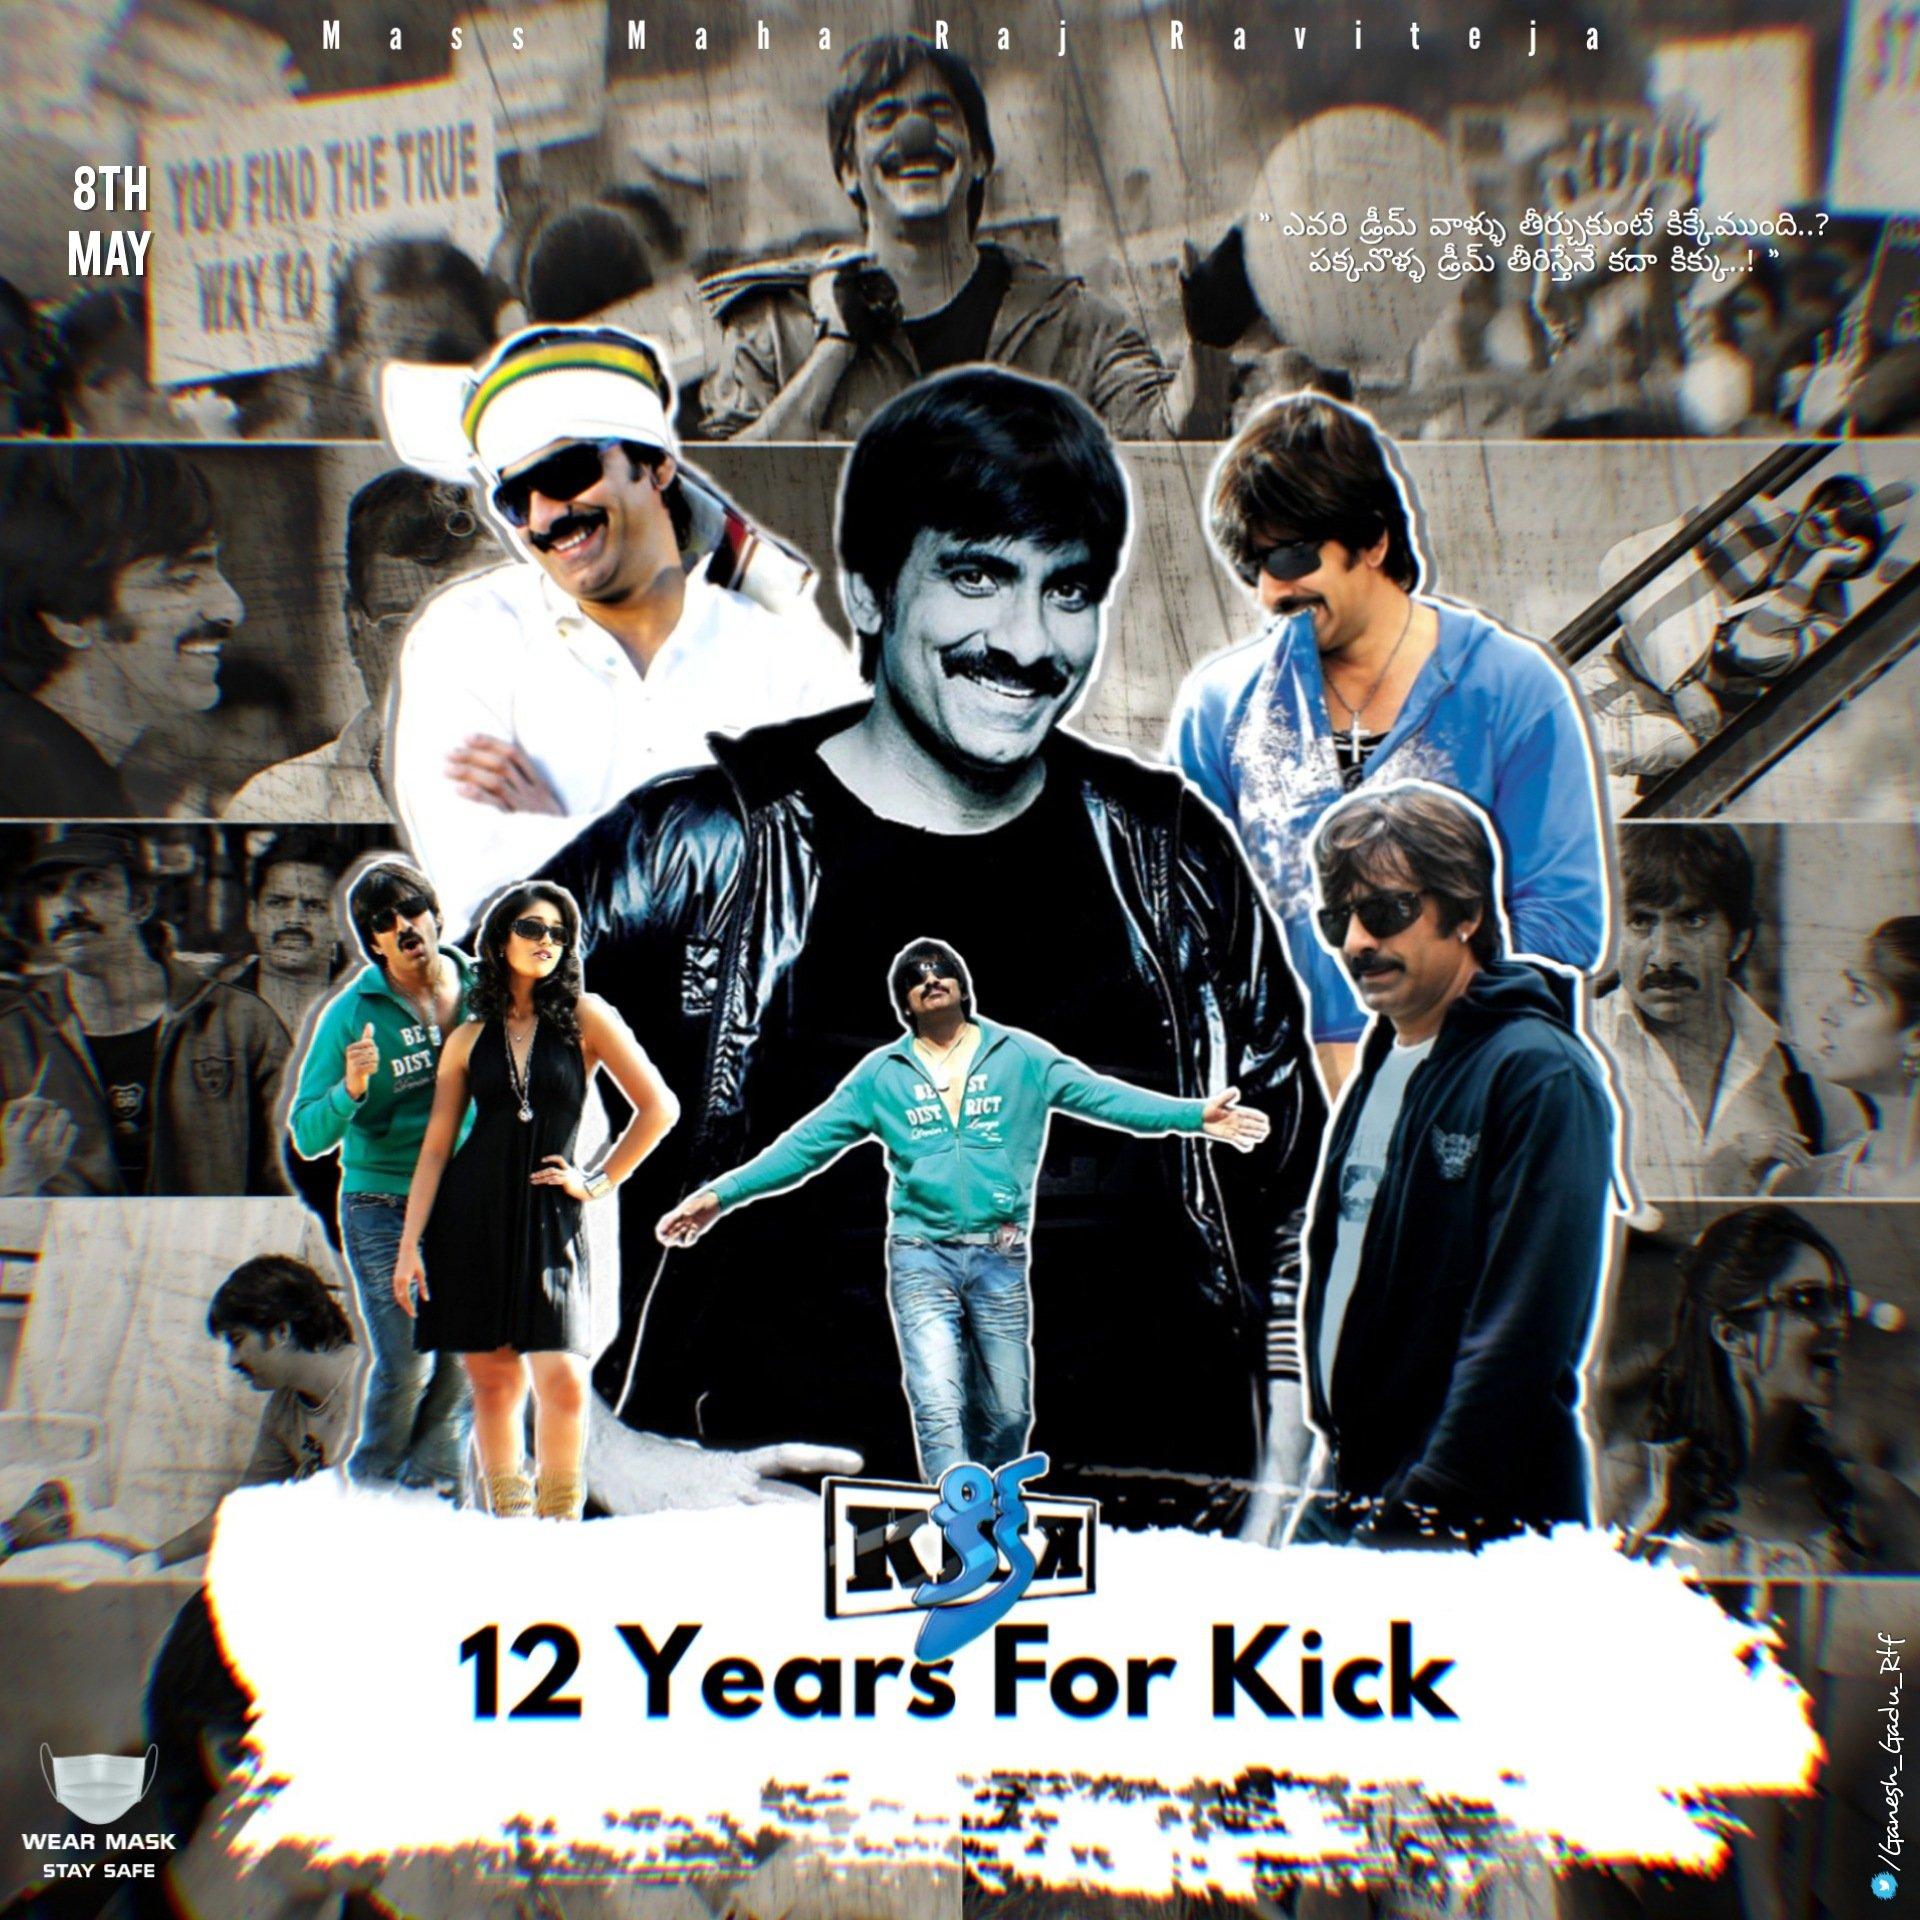 12 Years For Kick : 12 సంవత్సరాల కిక్.. Photo : Twitter